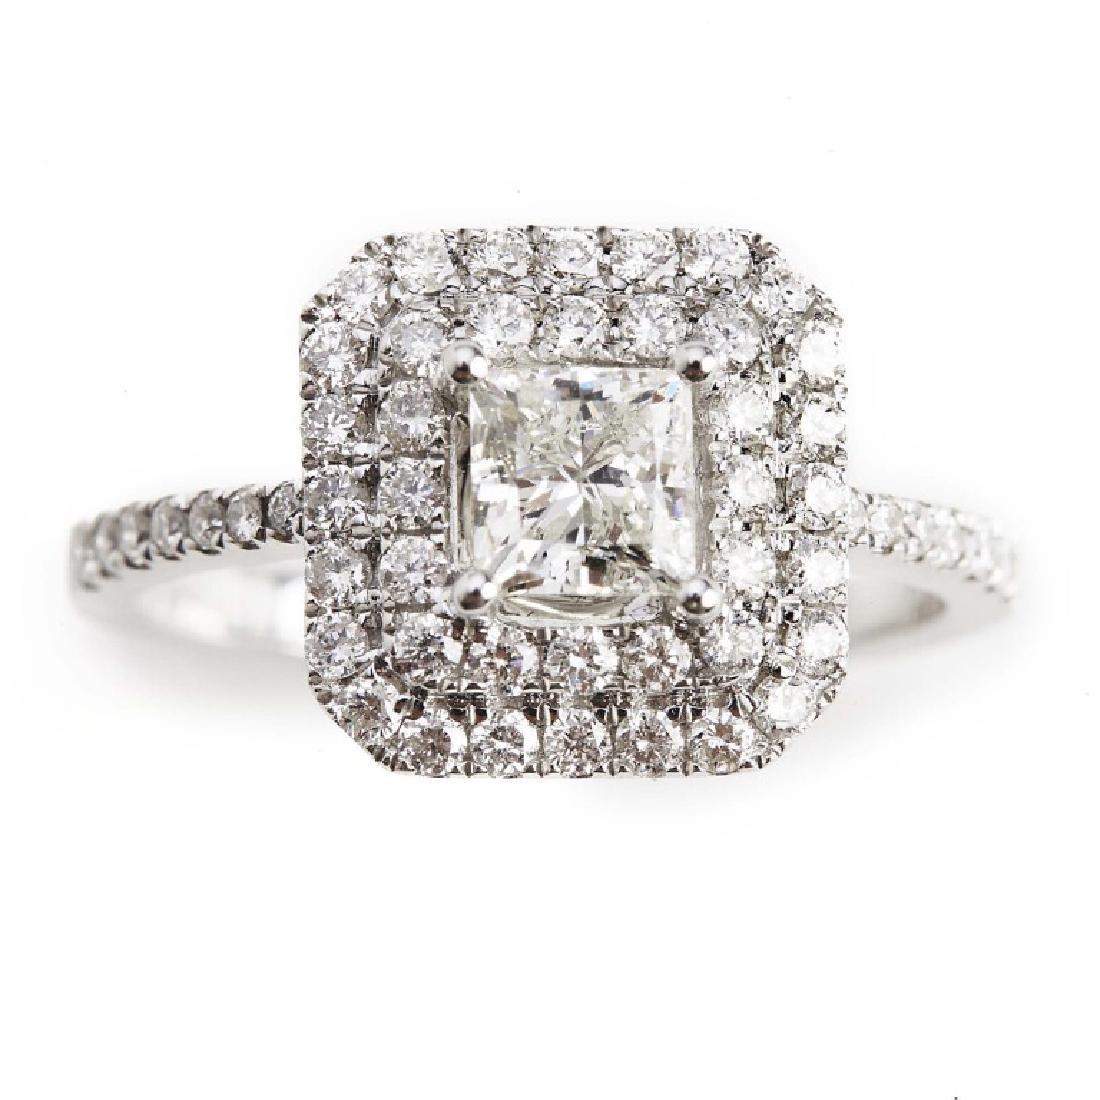 A diamond ring set with a princess-cut diamond and